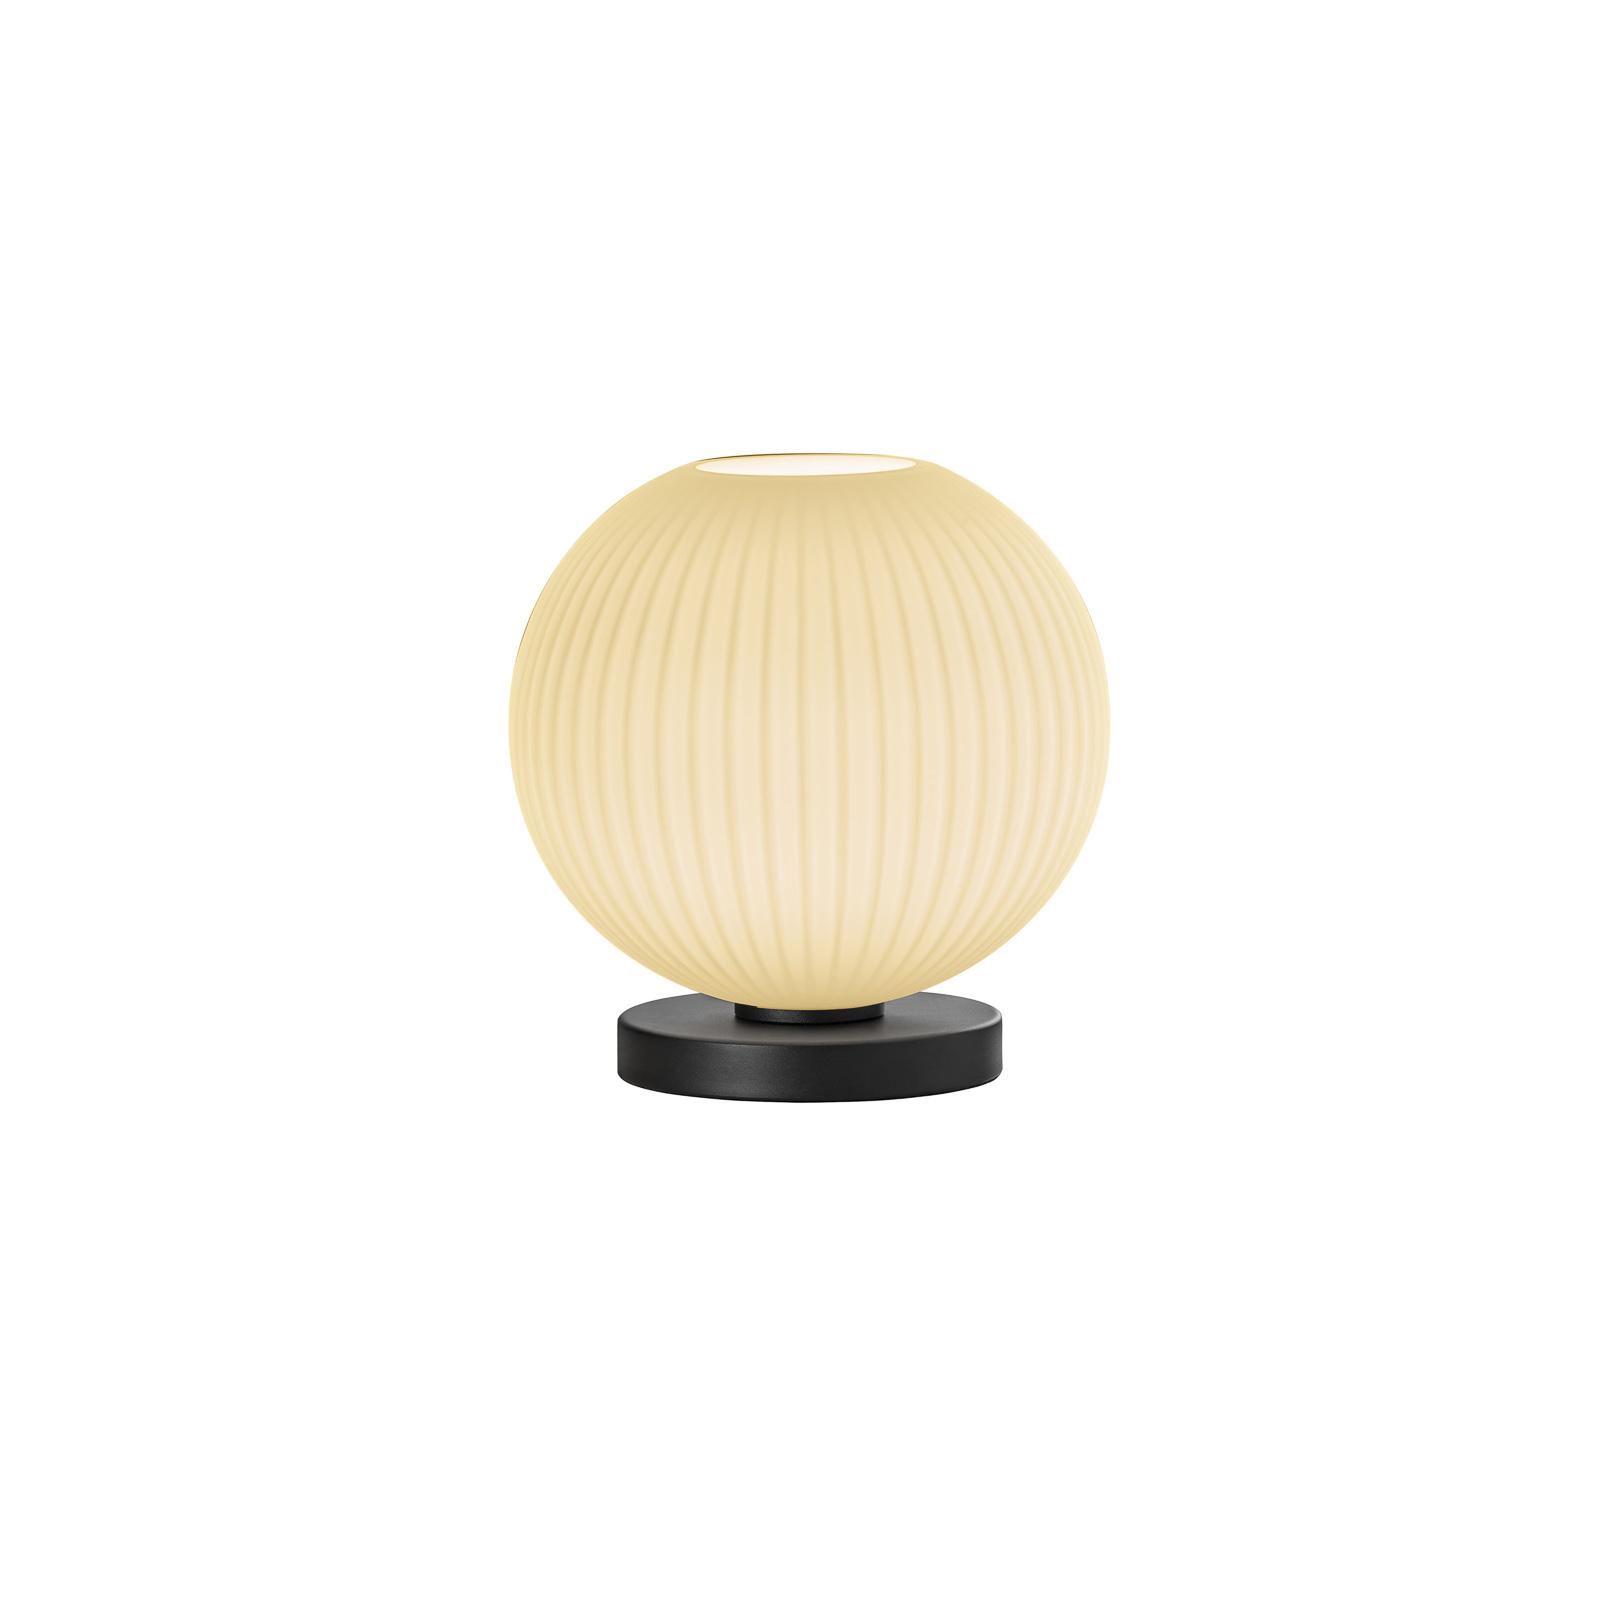 B-Leuchten Loft lampa stołowa ze szkła